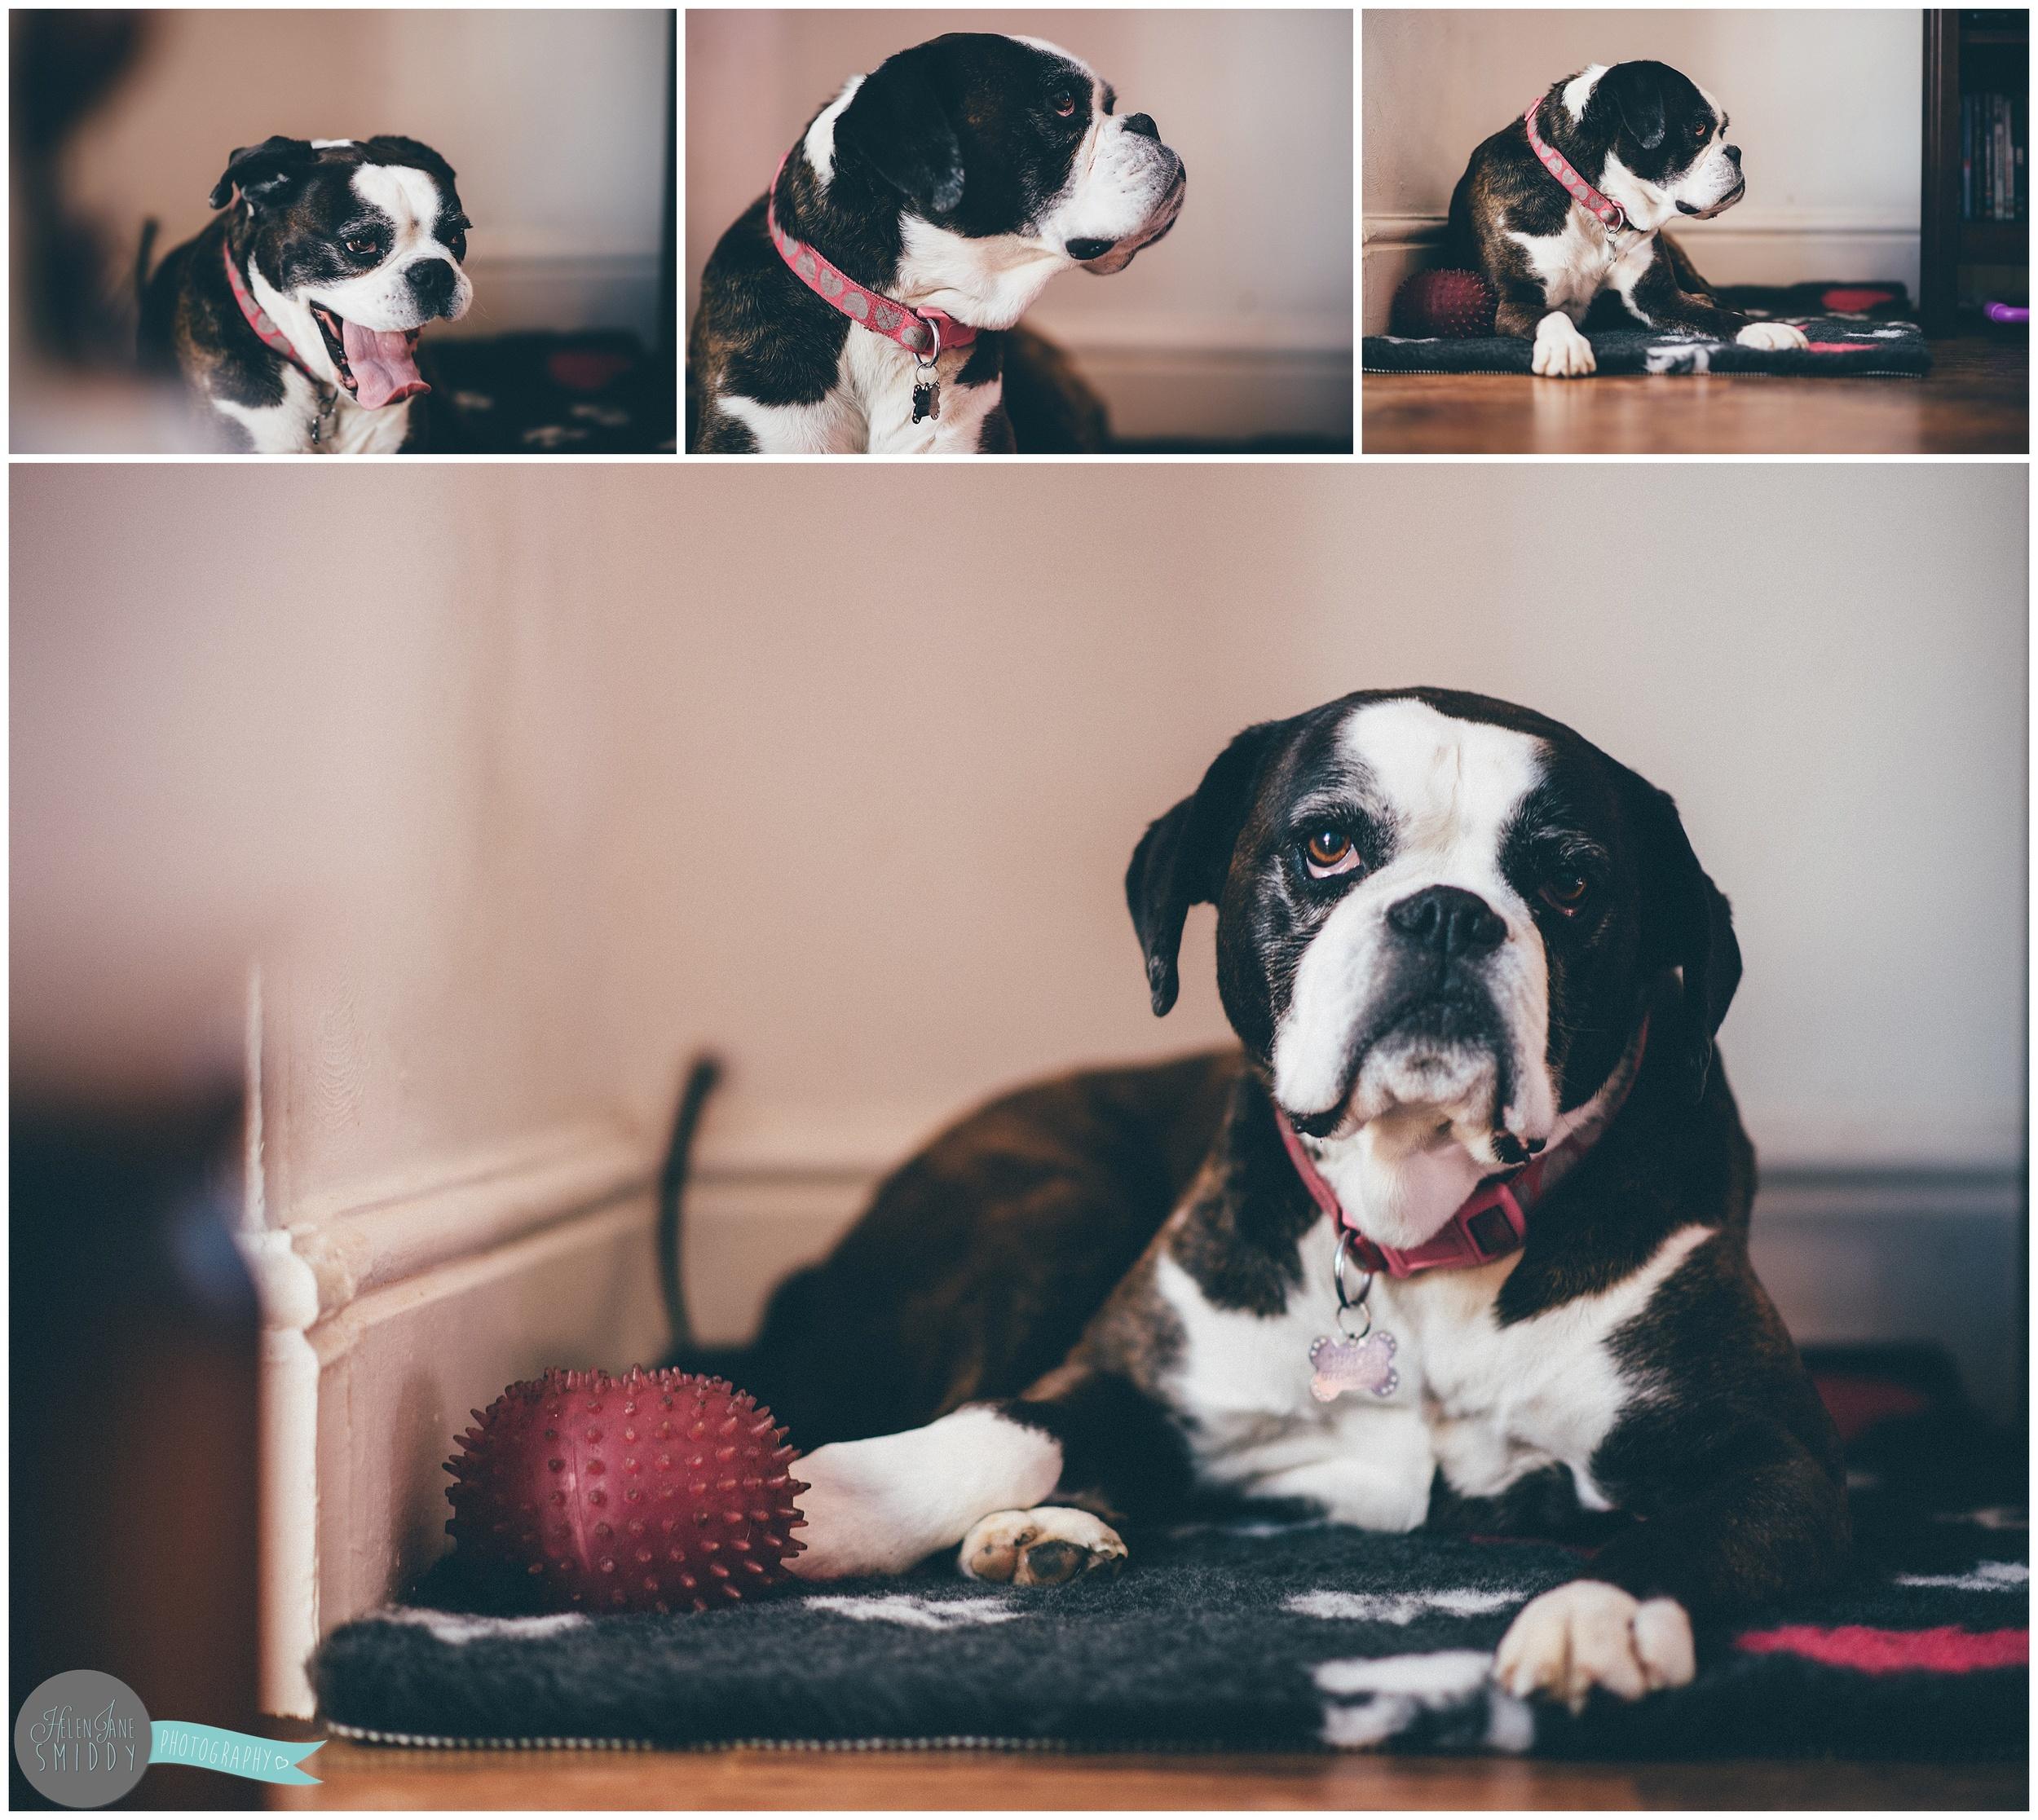 Newborn-family-photoshoot-delamere-cheshire-chester-lifestyle-photography-boxer-dog-pet-photography